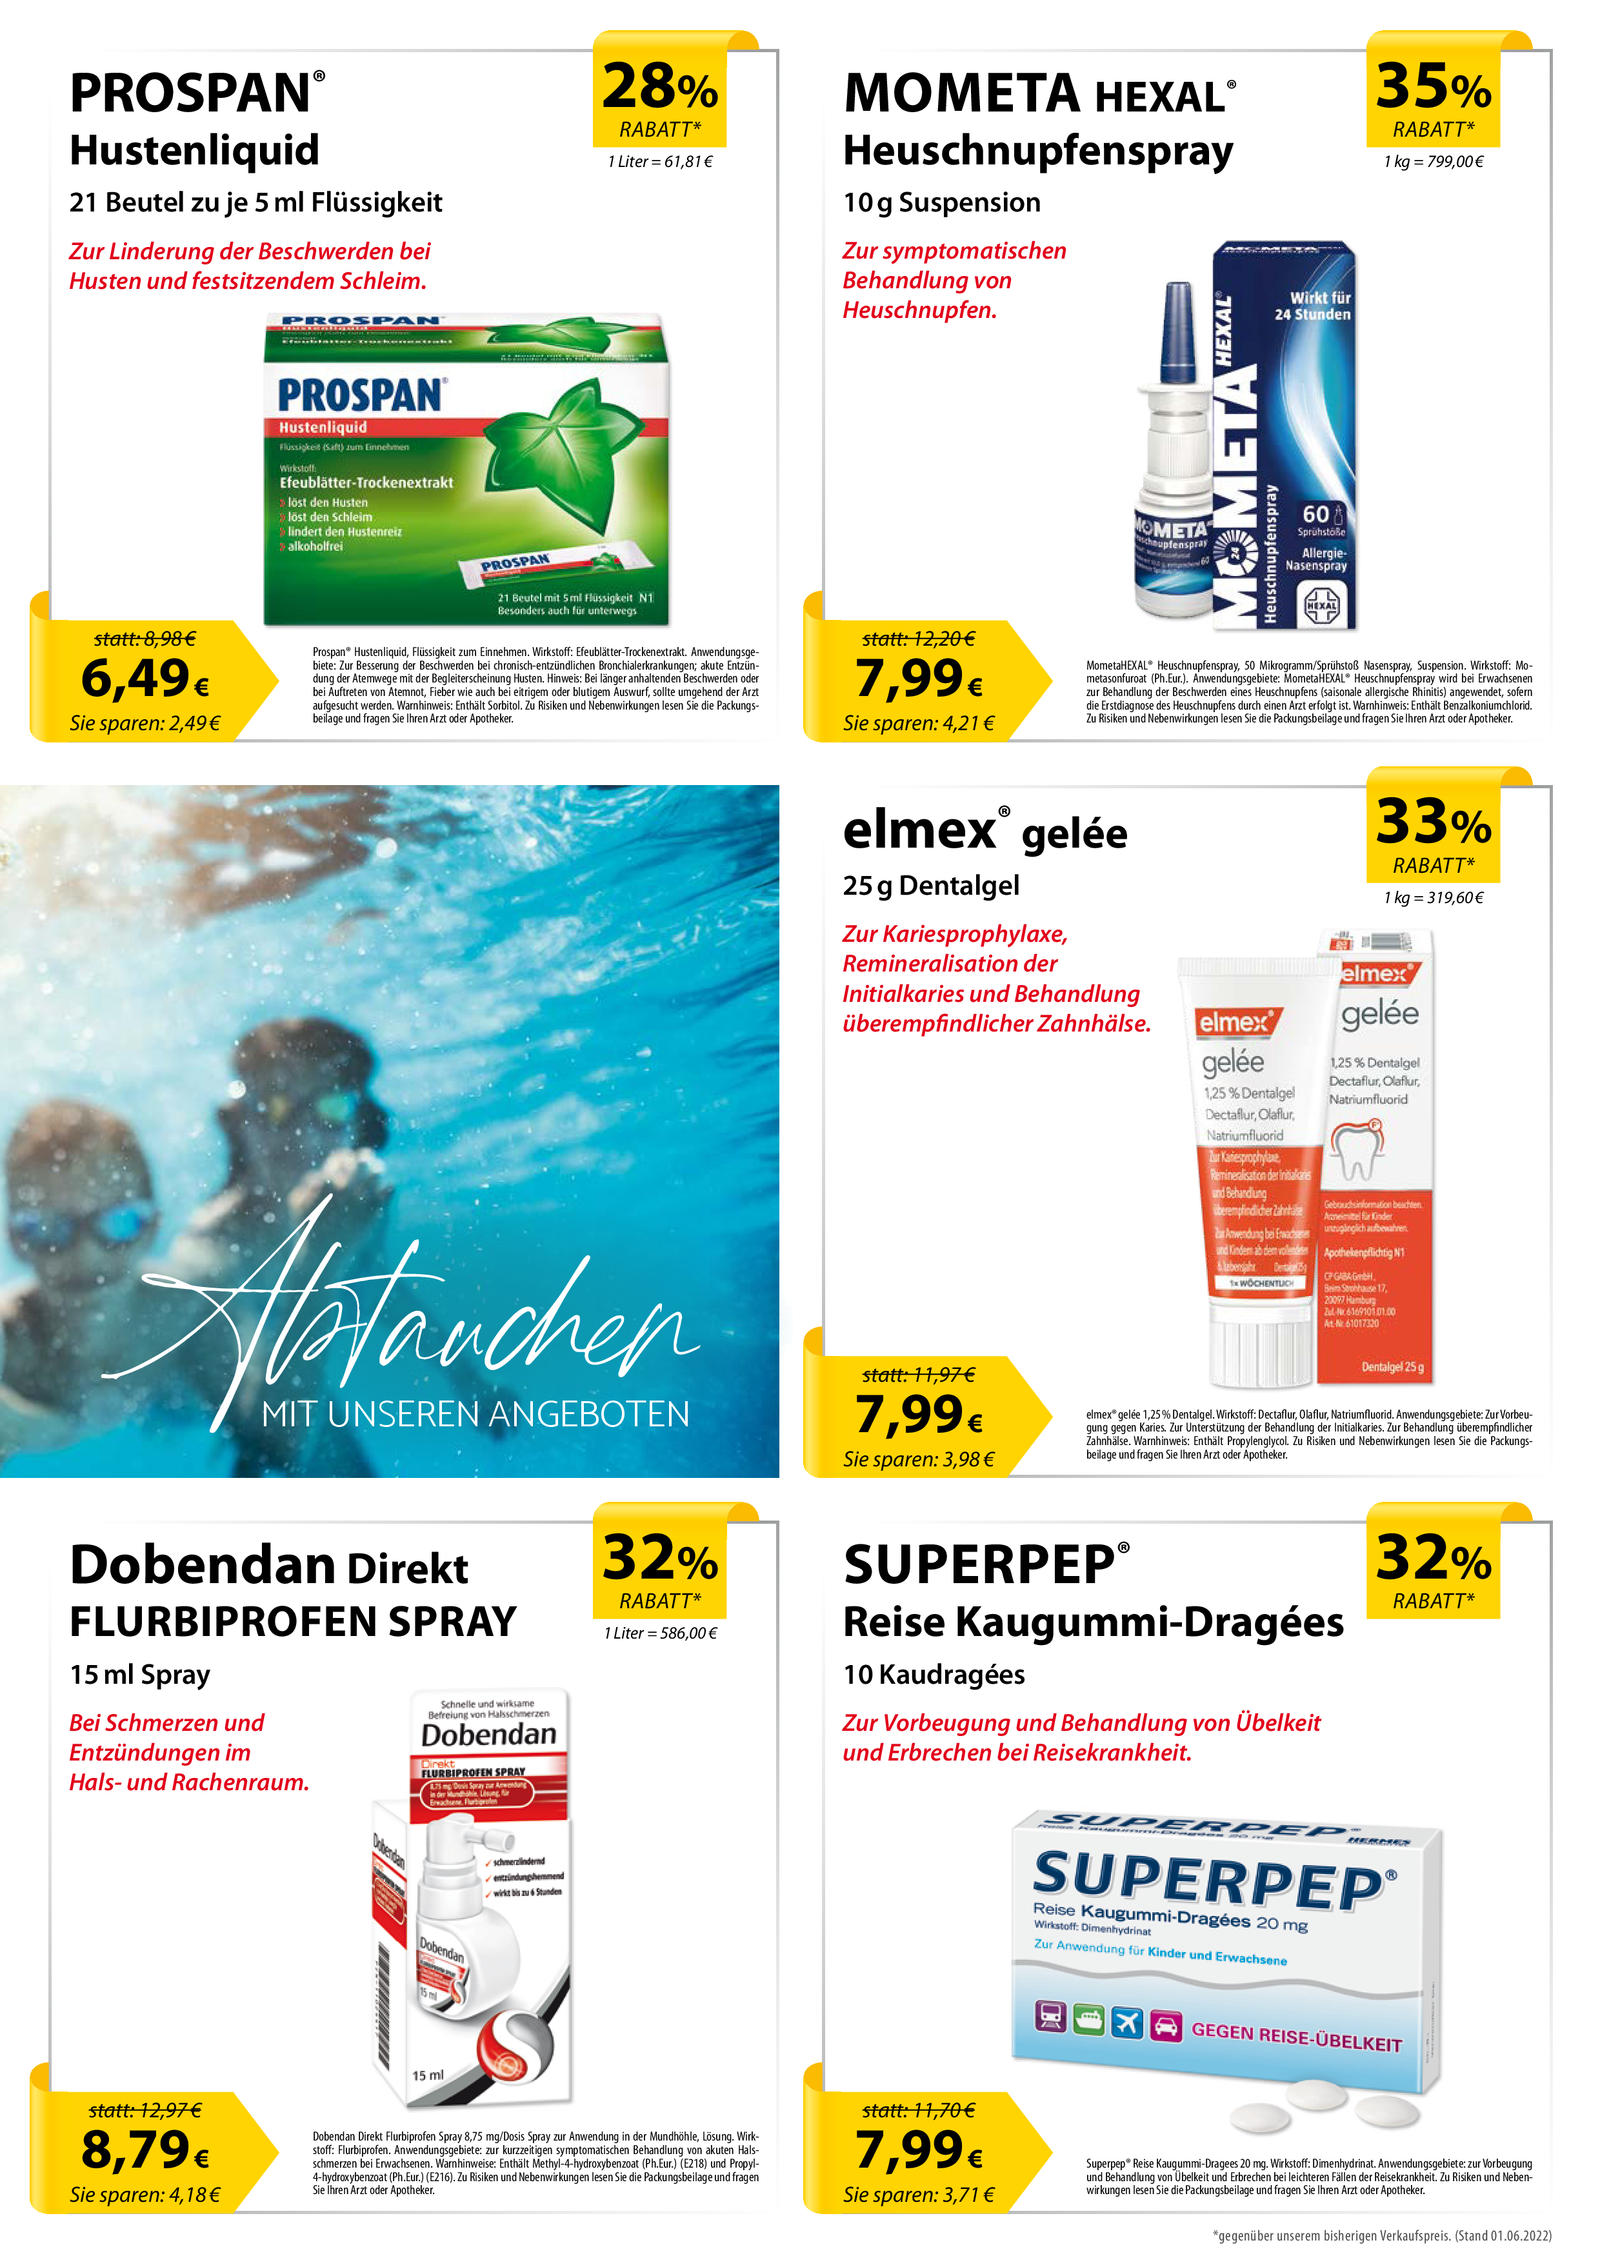 https://mein-uploads.apocdn.net/20392/leaflets/20392_flyer-Seite3.png